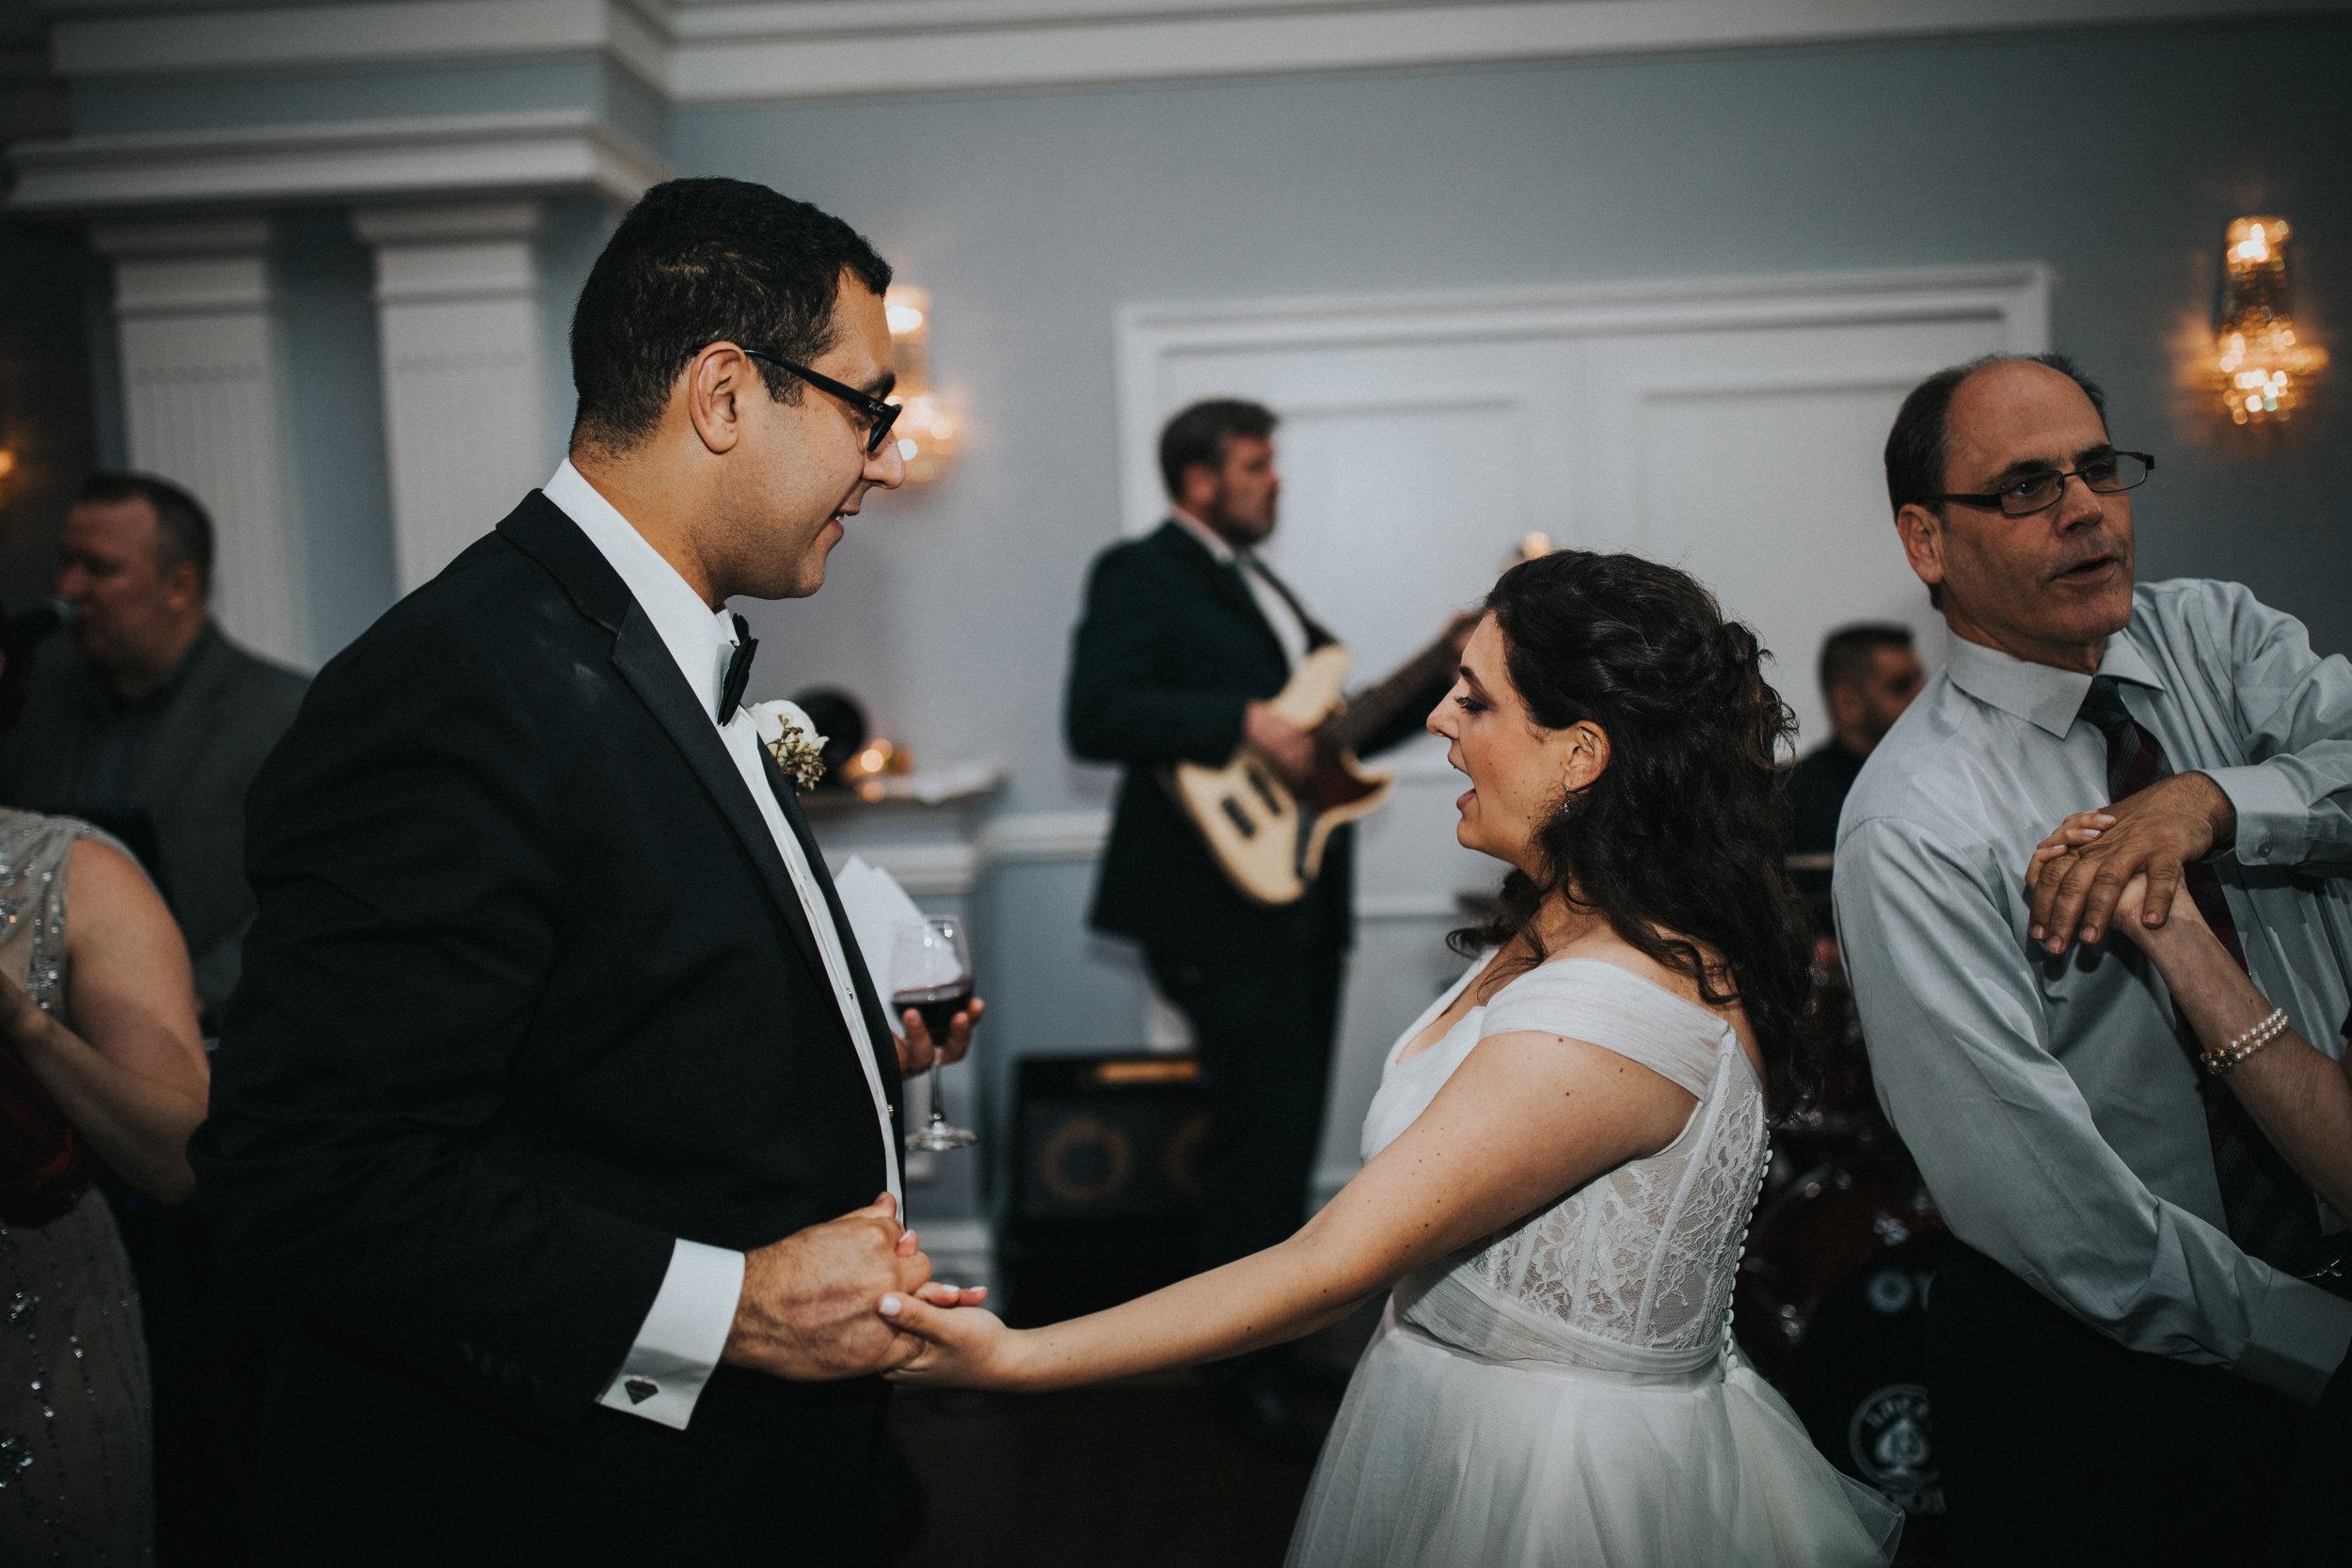 JennaLynnPhotography-NJWeddingPhotographer-Philadelphia-Wedding-ArtsBallroom-Reception-142.jpg